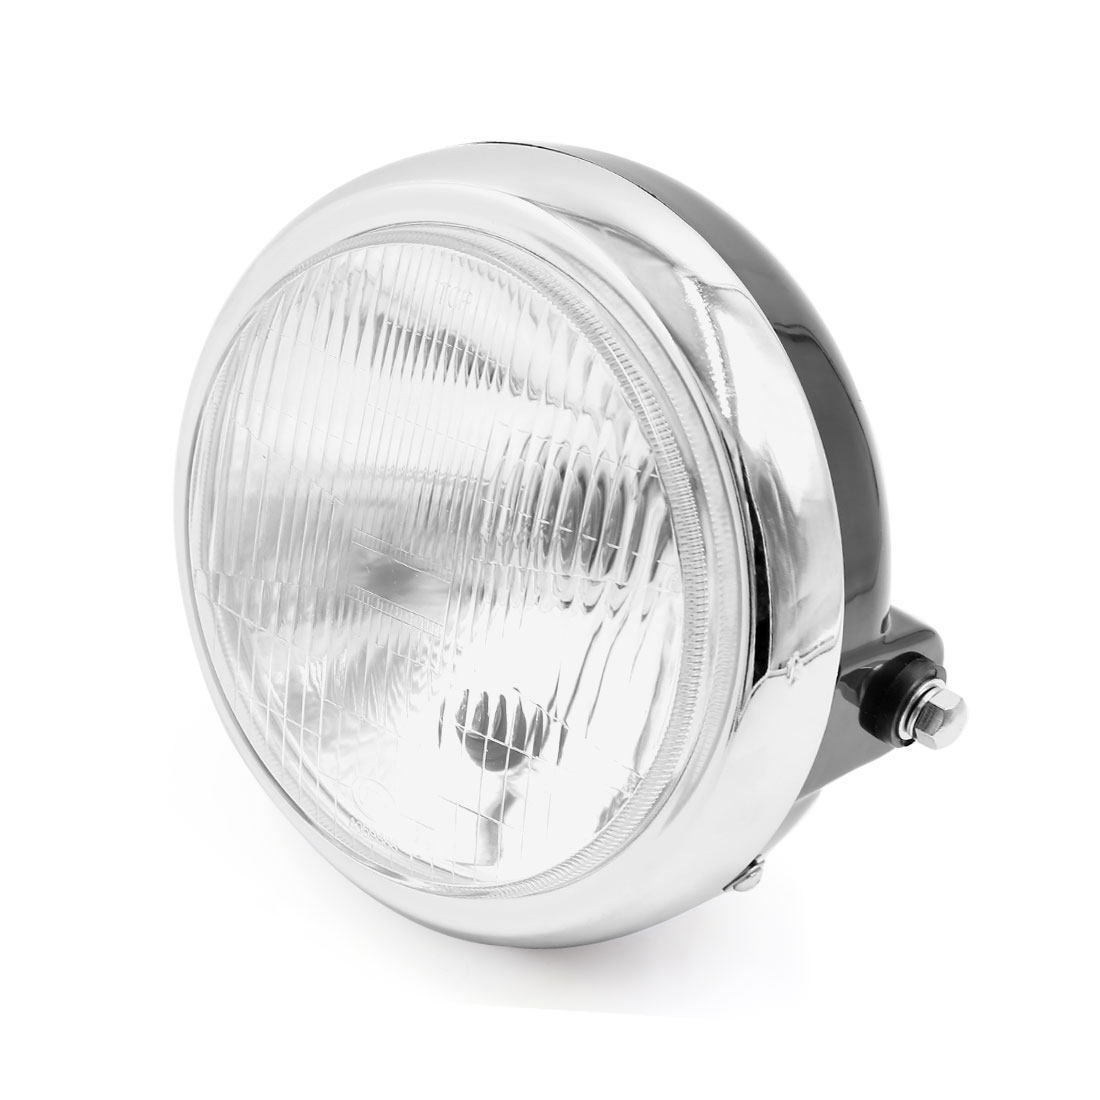 "7"" Dia Black Plastic Shell Motorcycle Headlight Headlamp Warm White for EN125"